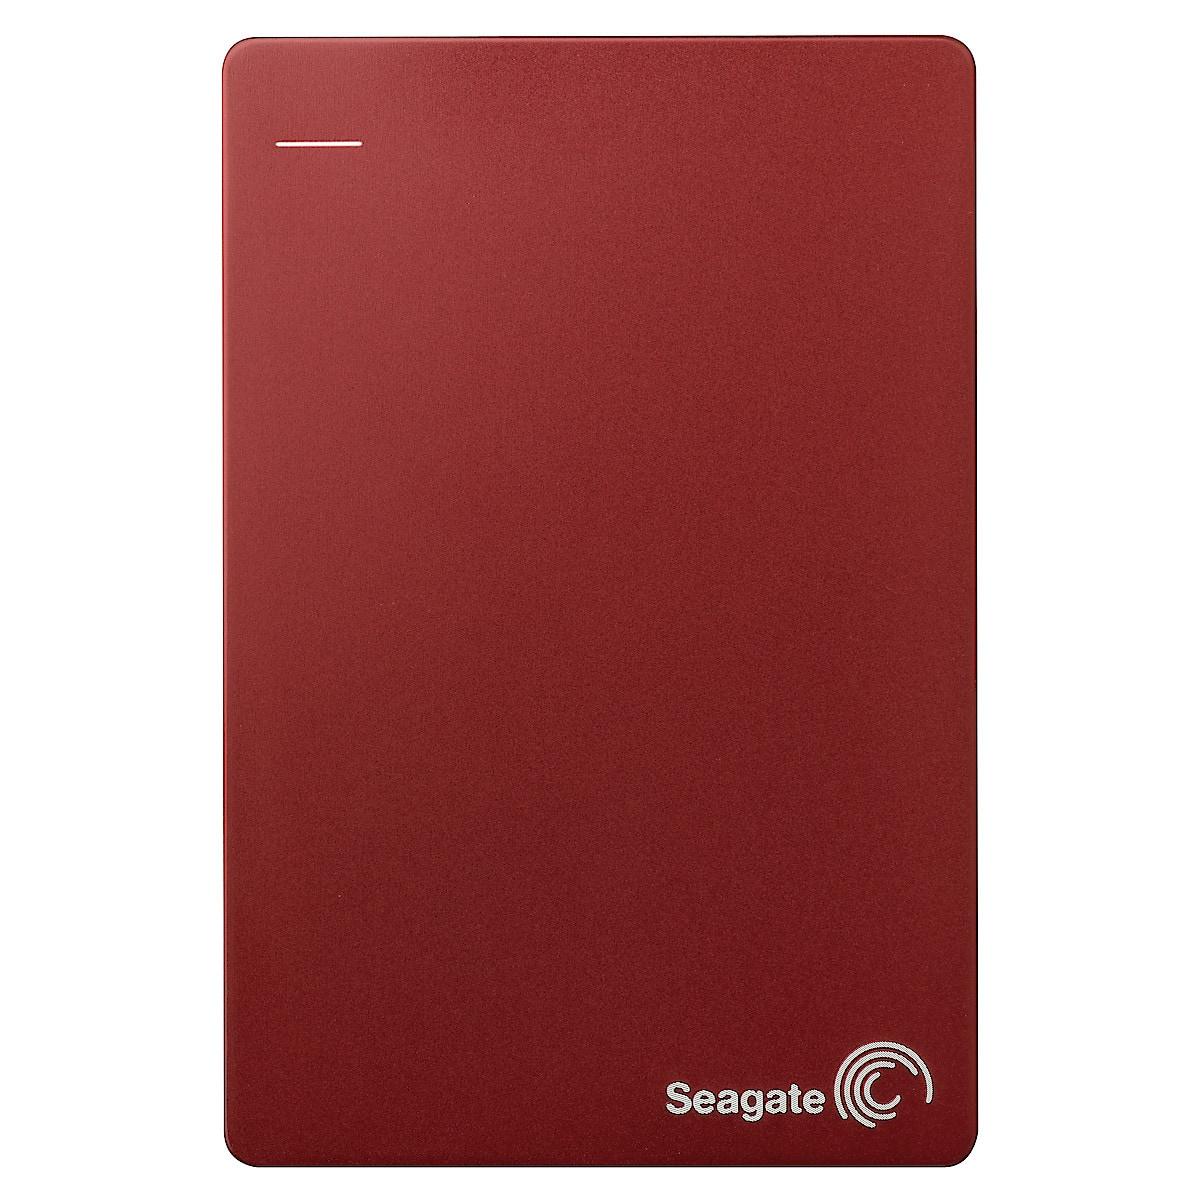 Ulkoinen kiintolevy Seagate Backup Plus Slim